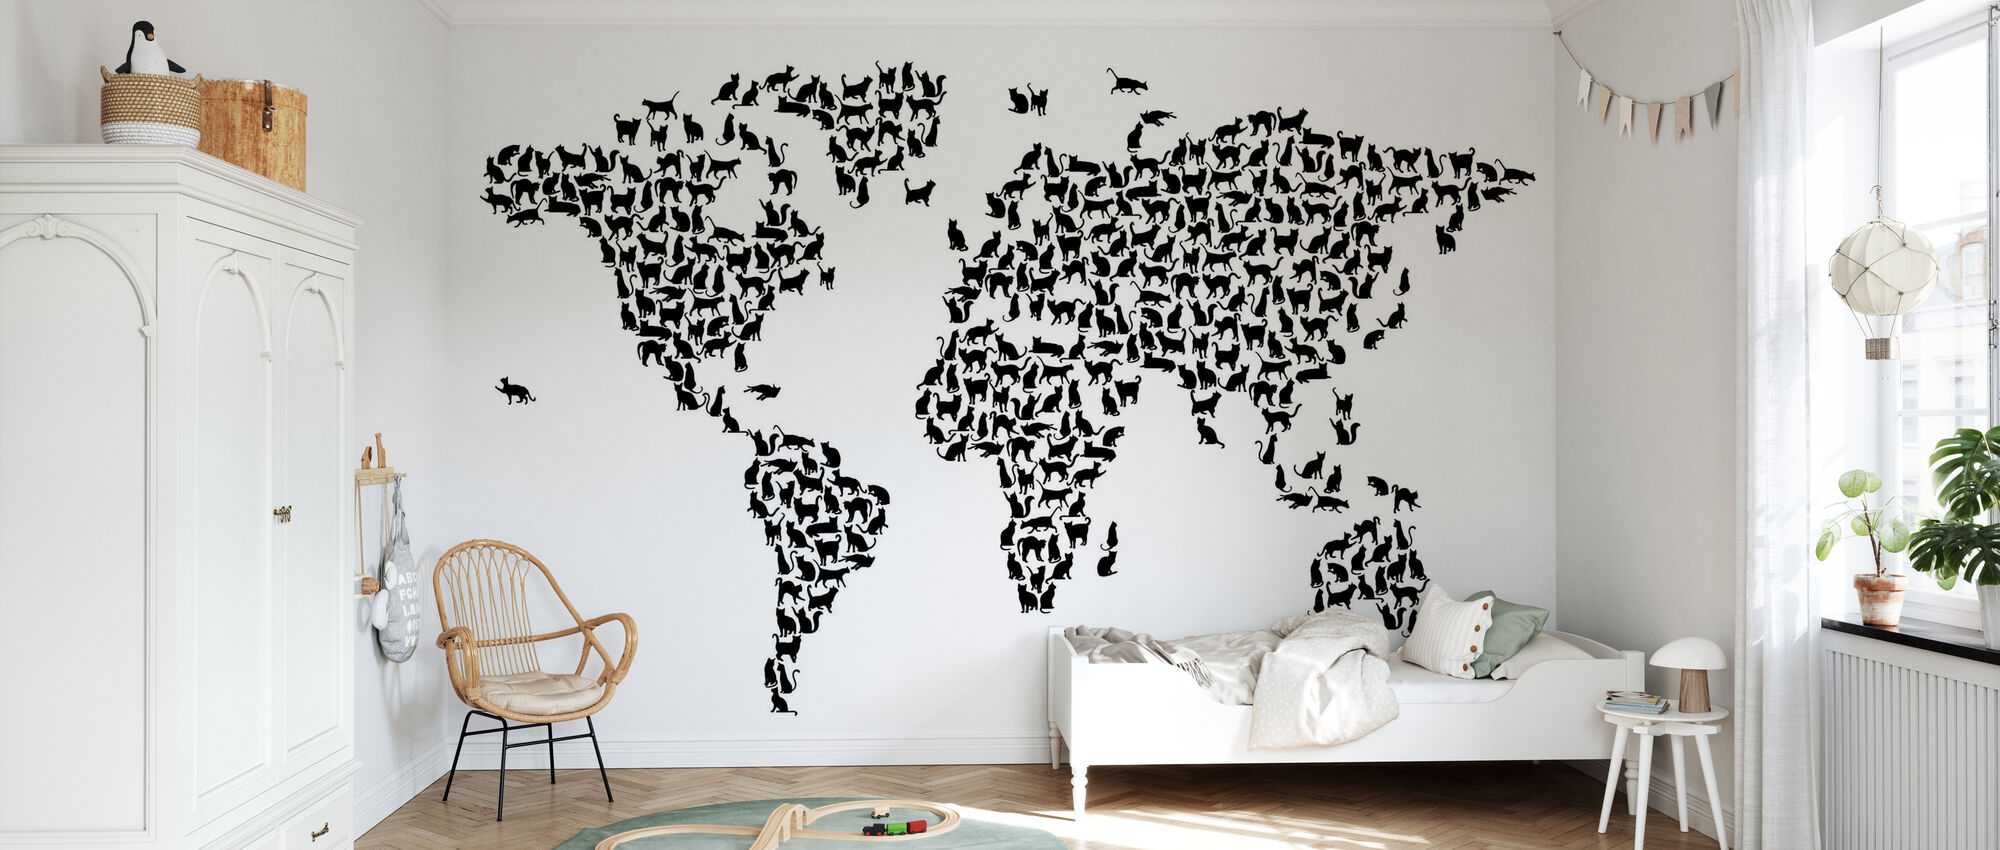 Katzen Weltkarte Schwarz - Tapete - Kinderzimmer